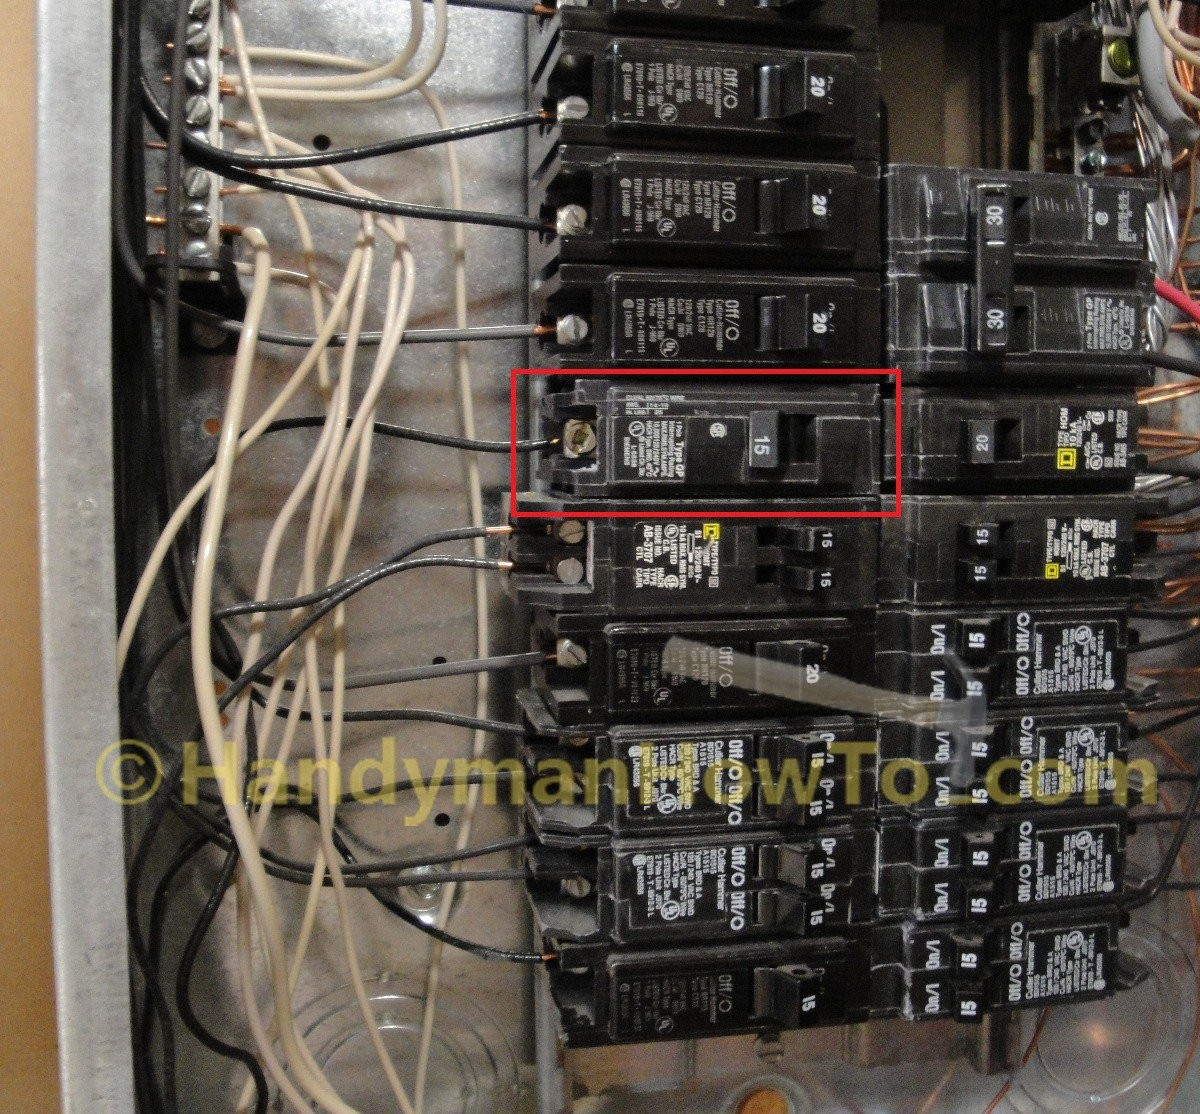 DSC Jpg Resize U003d665 2C617 U0026ssl U003d1 With Square D Load Center Wiring Diagram